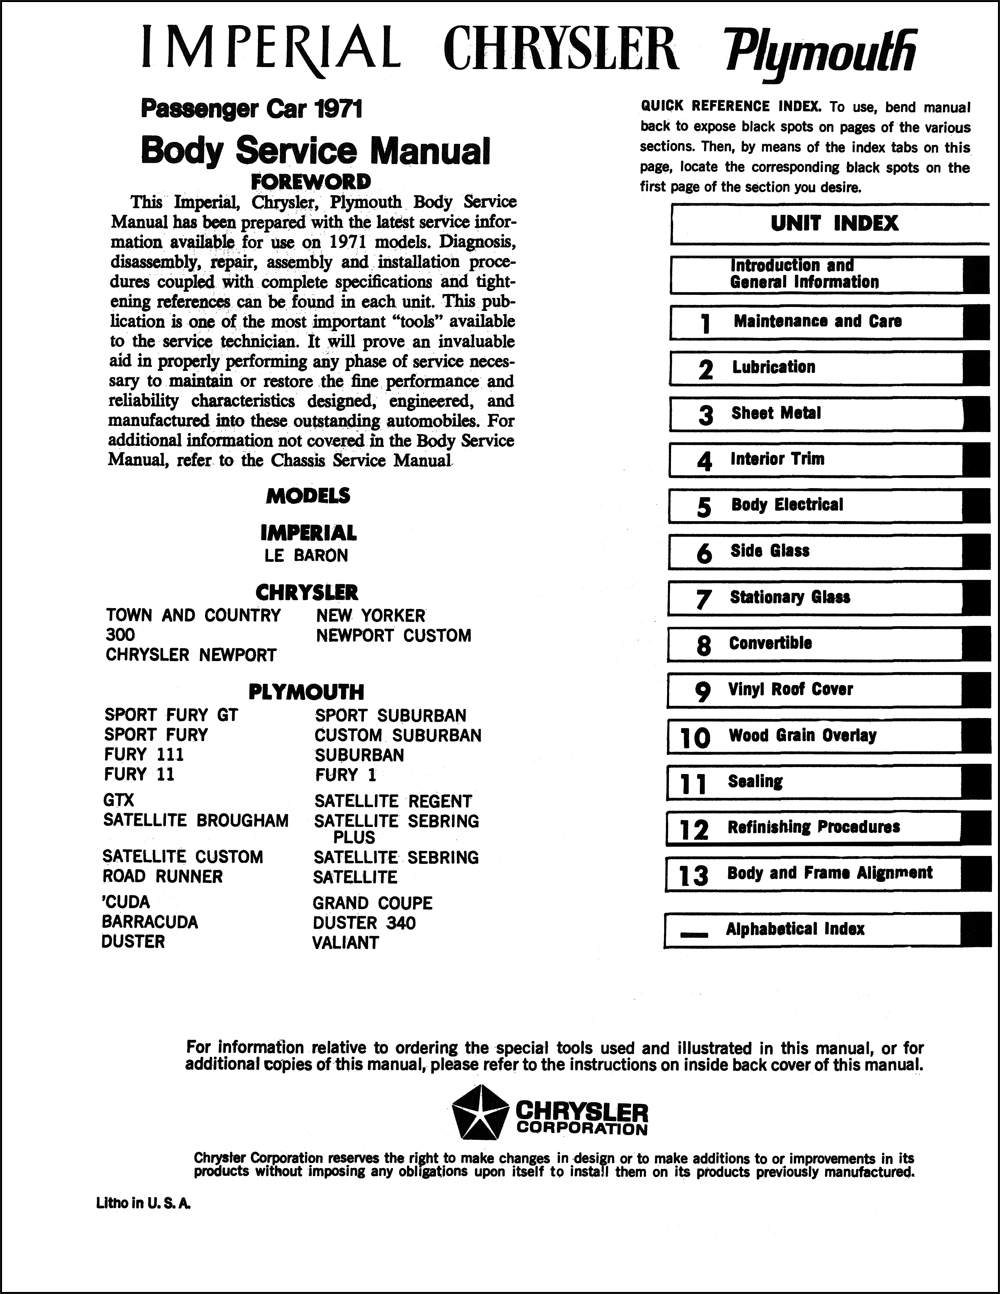 1971 Chrysler Plymouth Factory Service Manual 2 Volume Set